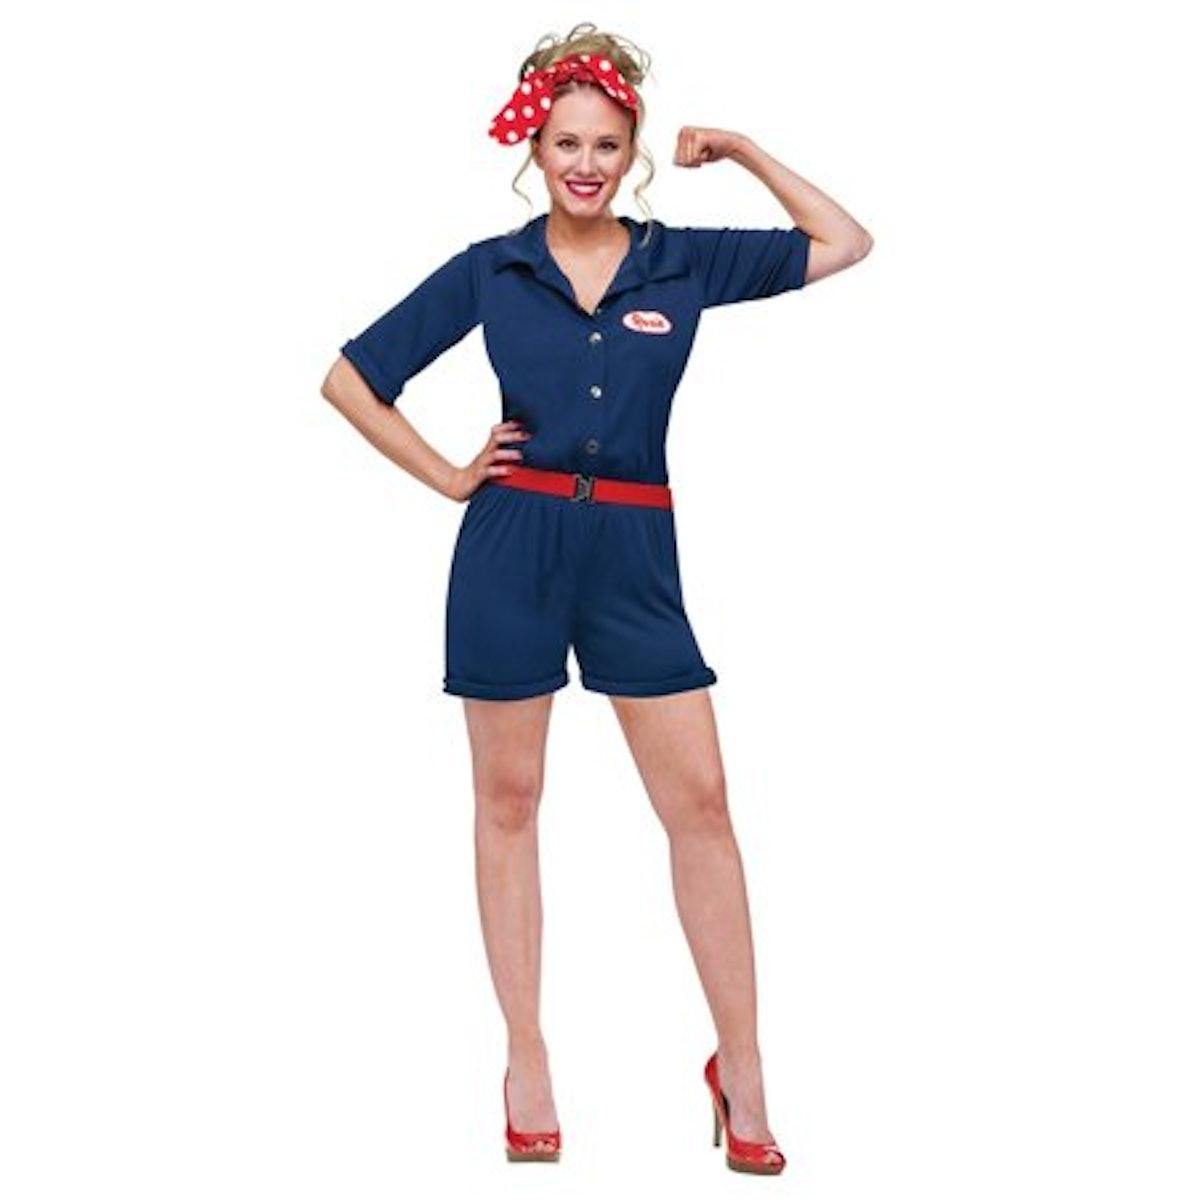 FUNWRD Rosie The Riveter Adult Costume